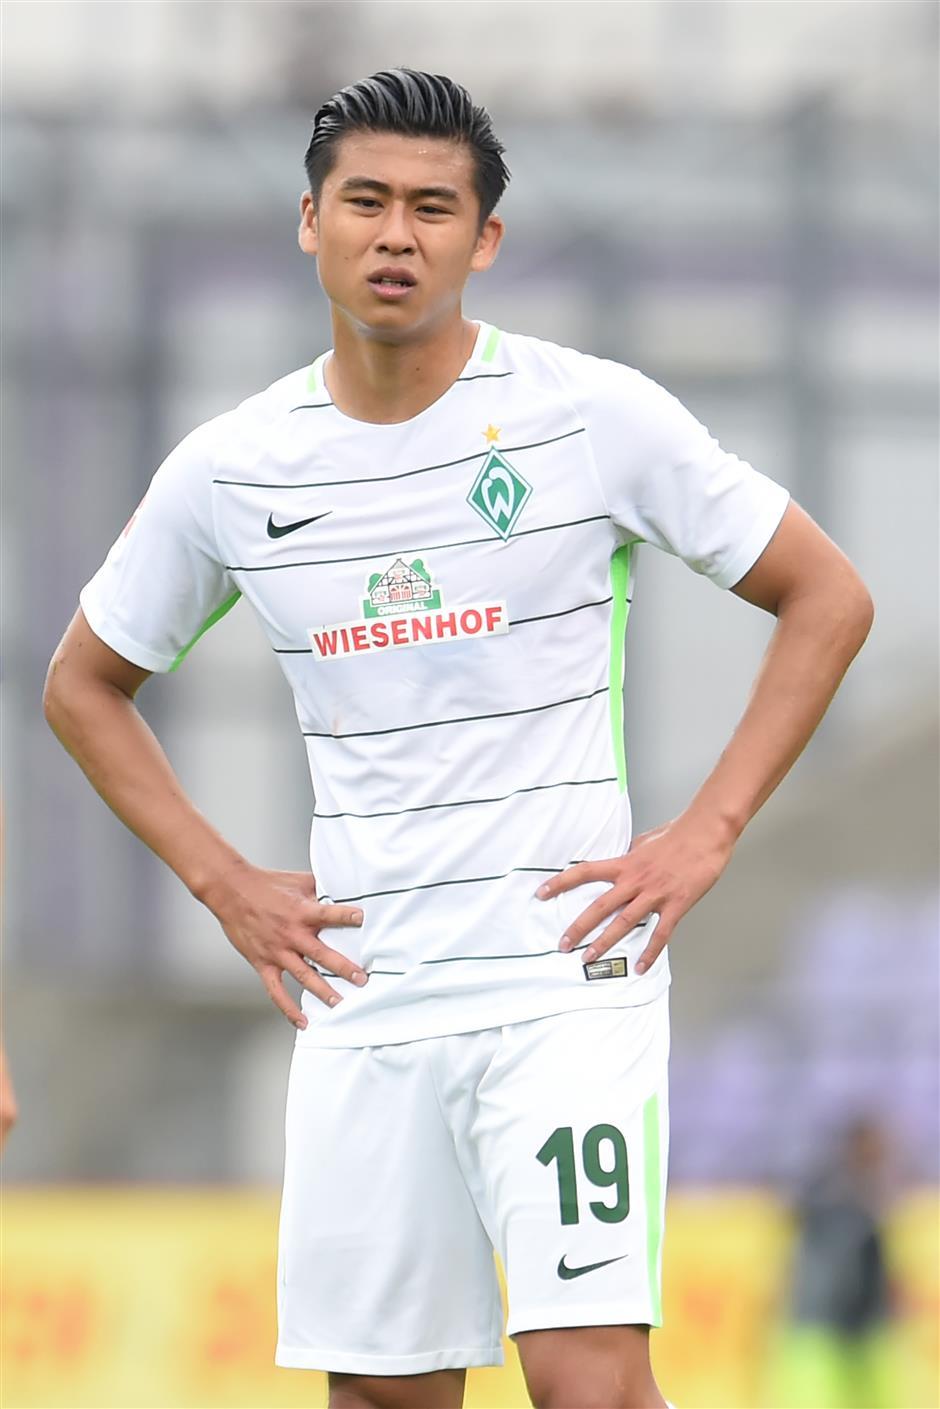 Fan wants more Chinese to follow Zhang's overseas adventure